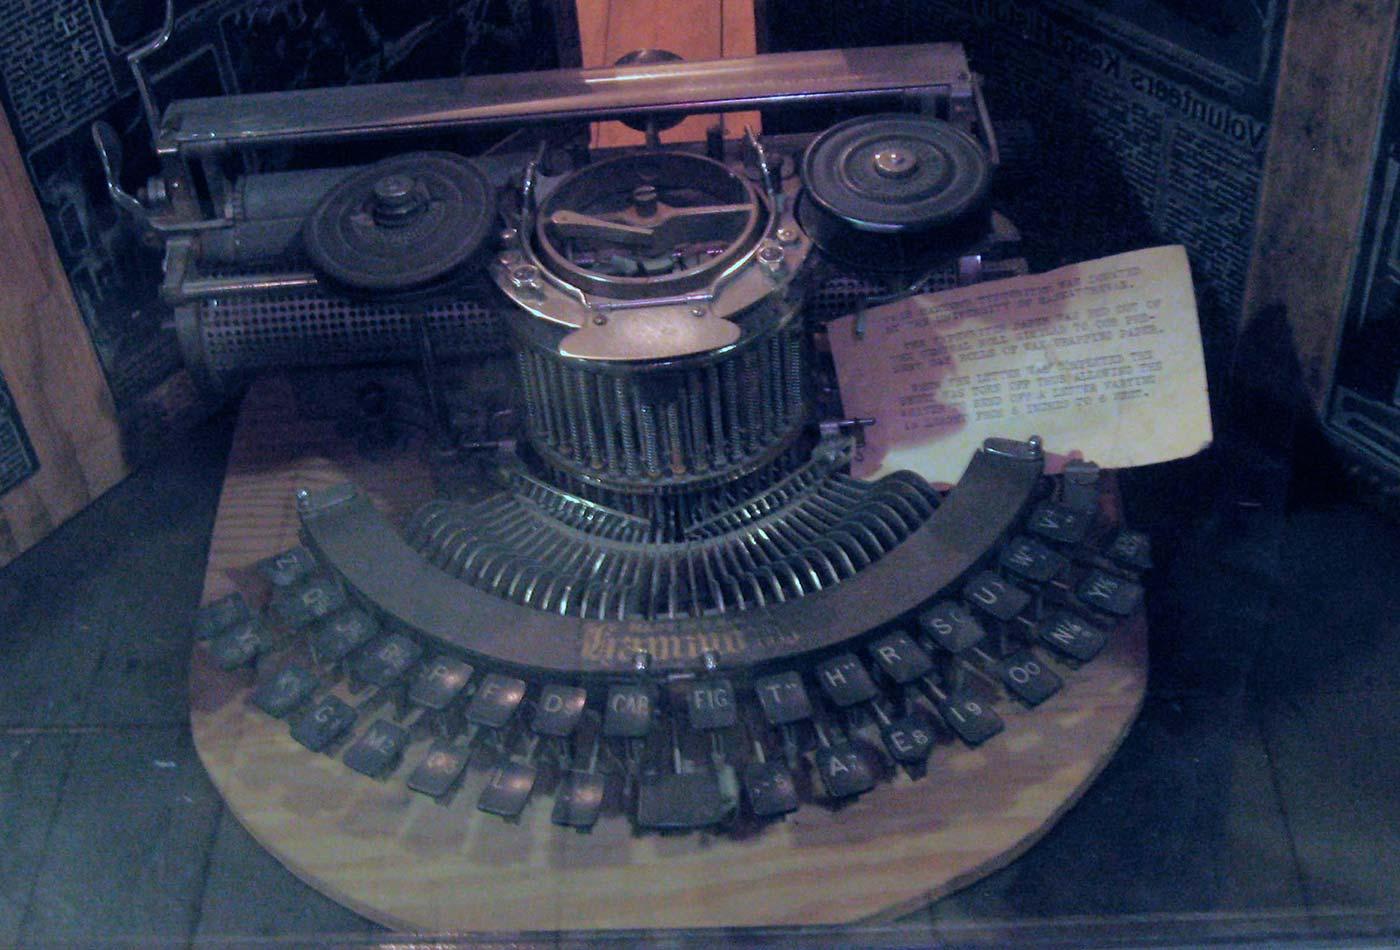 Hammond Model 1B typewriter from a Saskatoon newspaper around 1910, shot at Western Development Museum, Saskatoon, Canada.